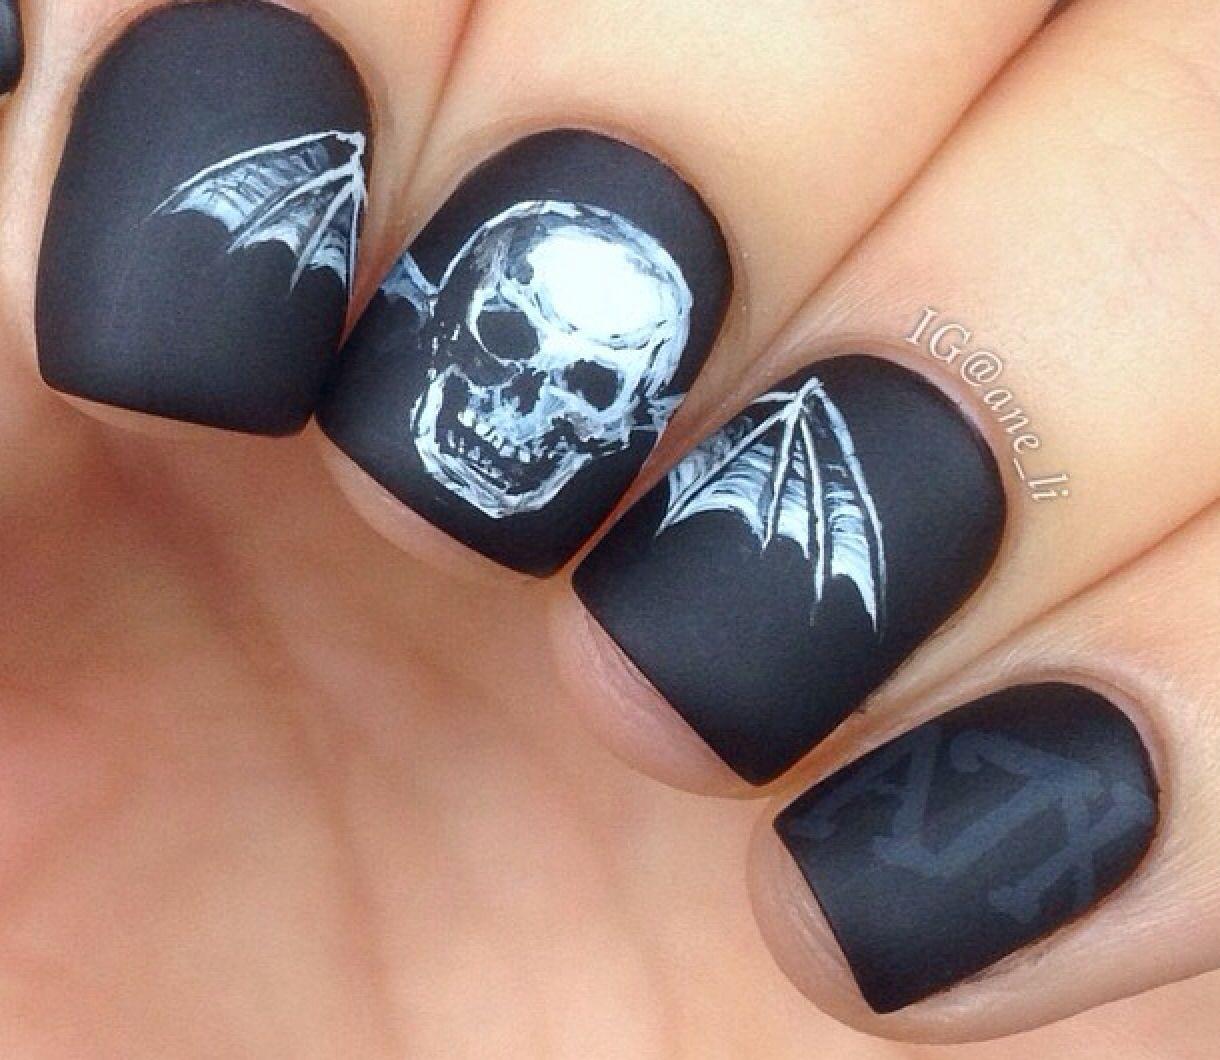 Avenged sevenfold nails | Skull nails, Punk nails, Skull ...